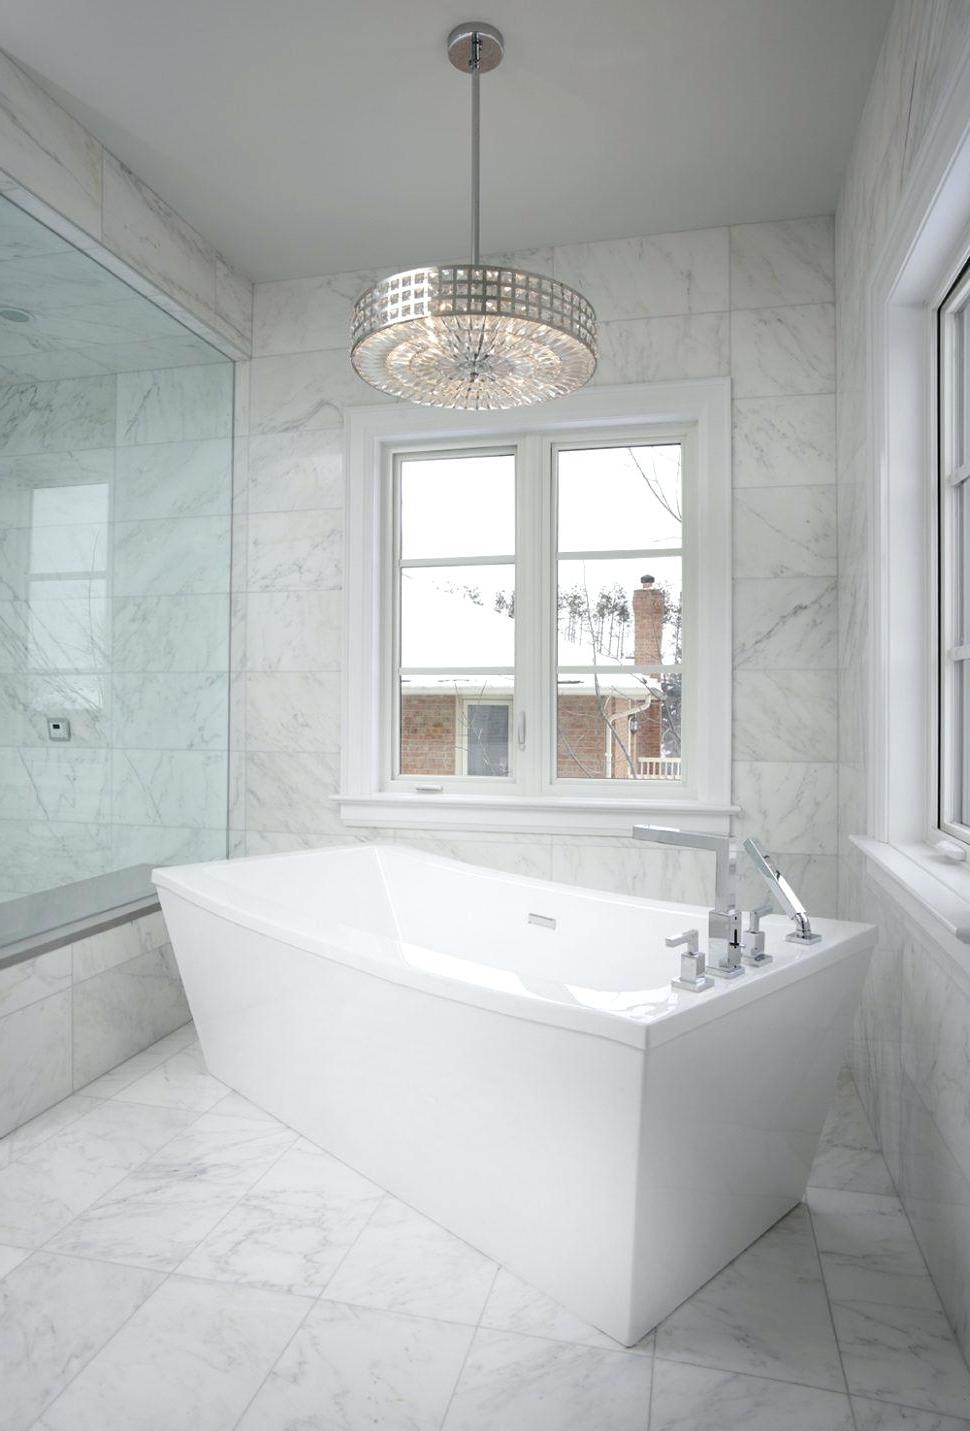 Favorite Chandeliers For The Bathroom Throughout Black Bathroom Chandelier Incredible Mini Bathroom Chandeliers (View 8 of 15)